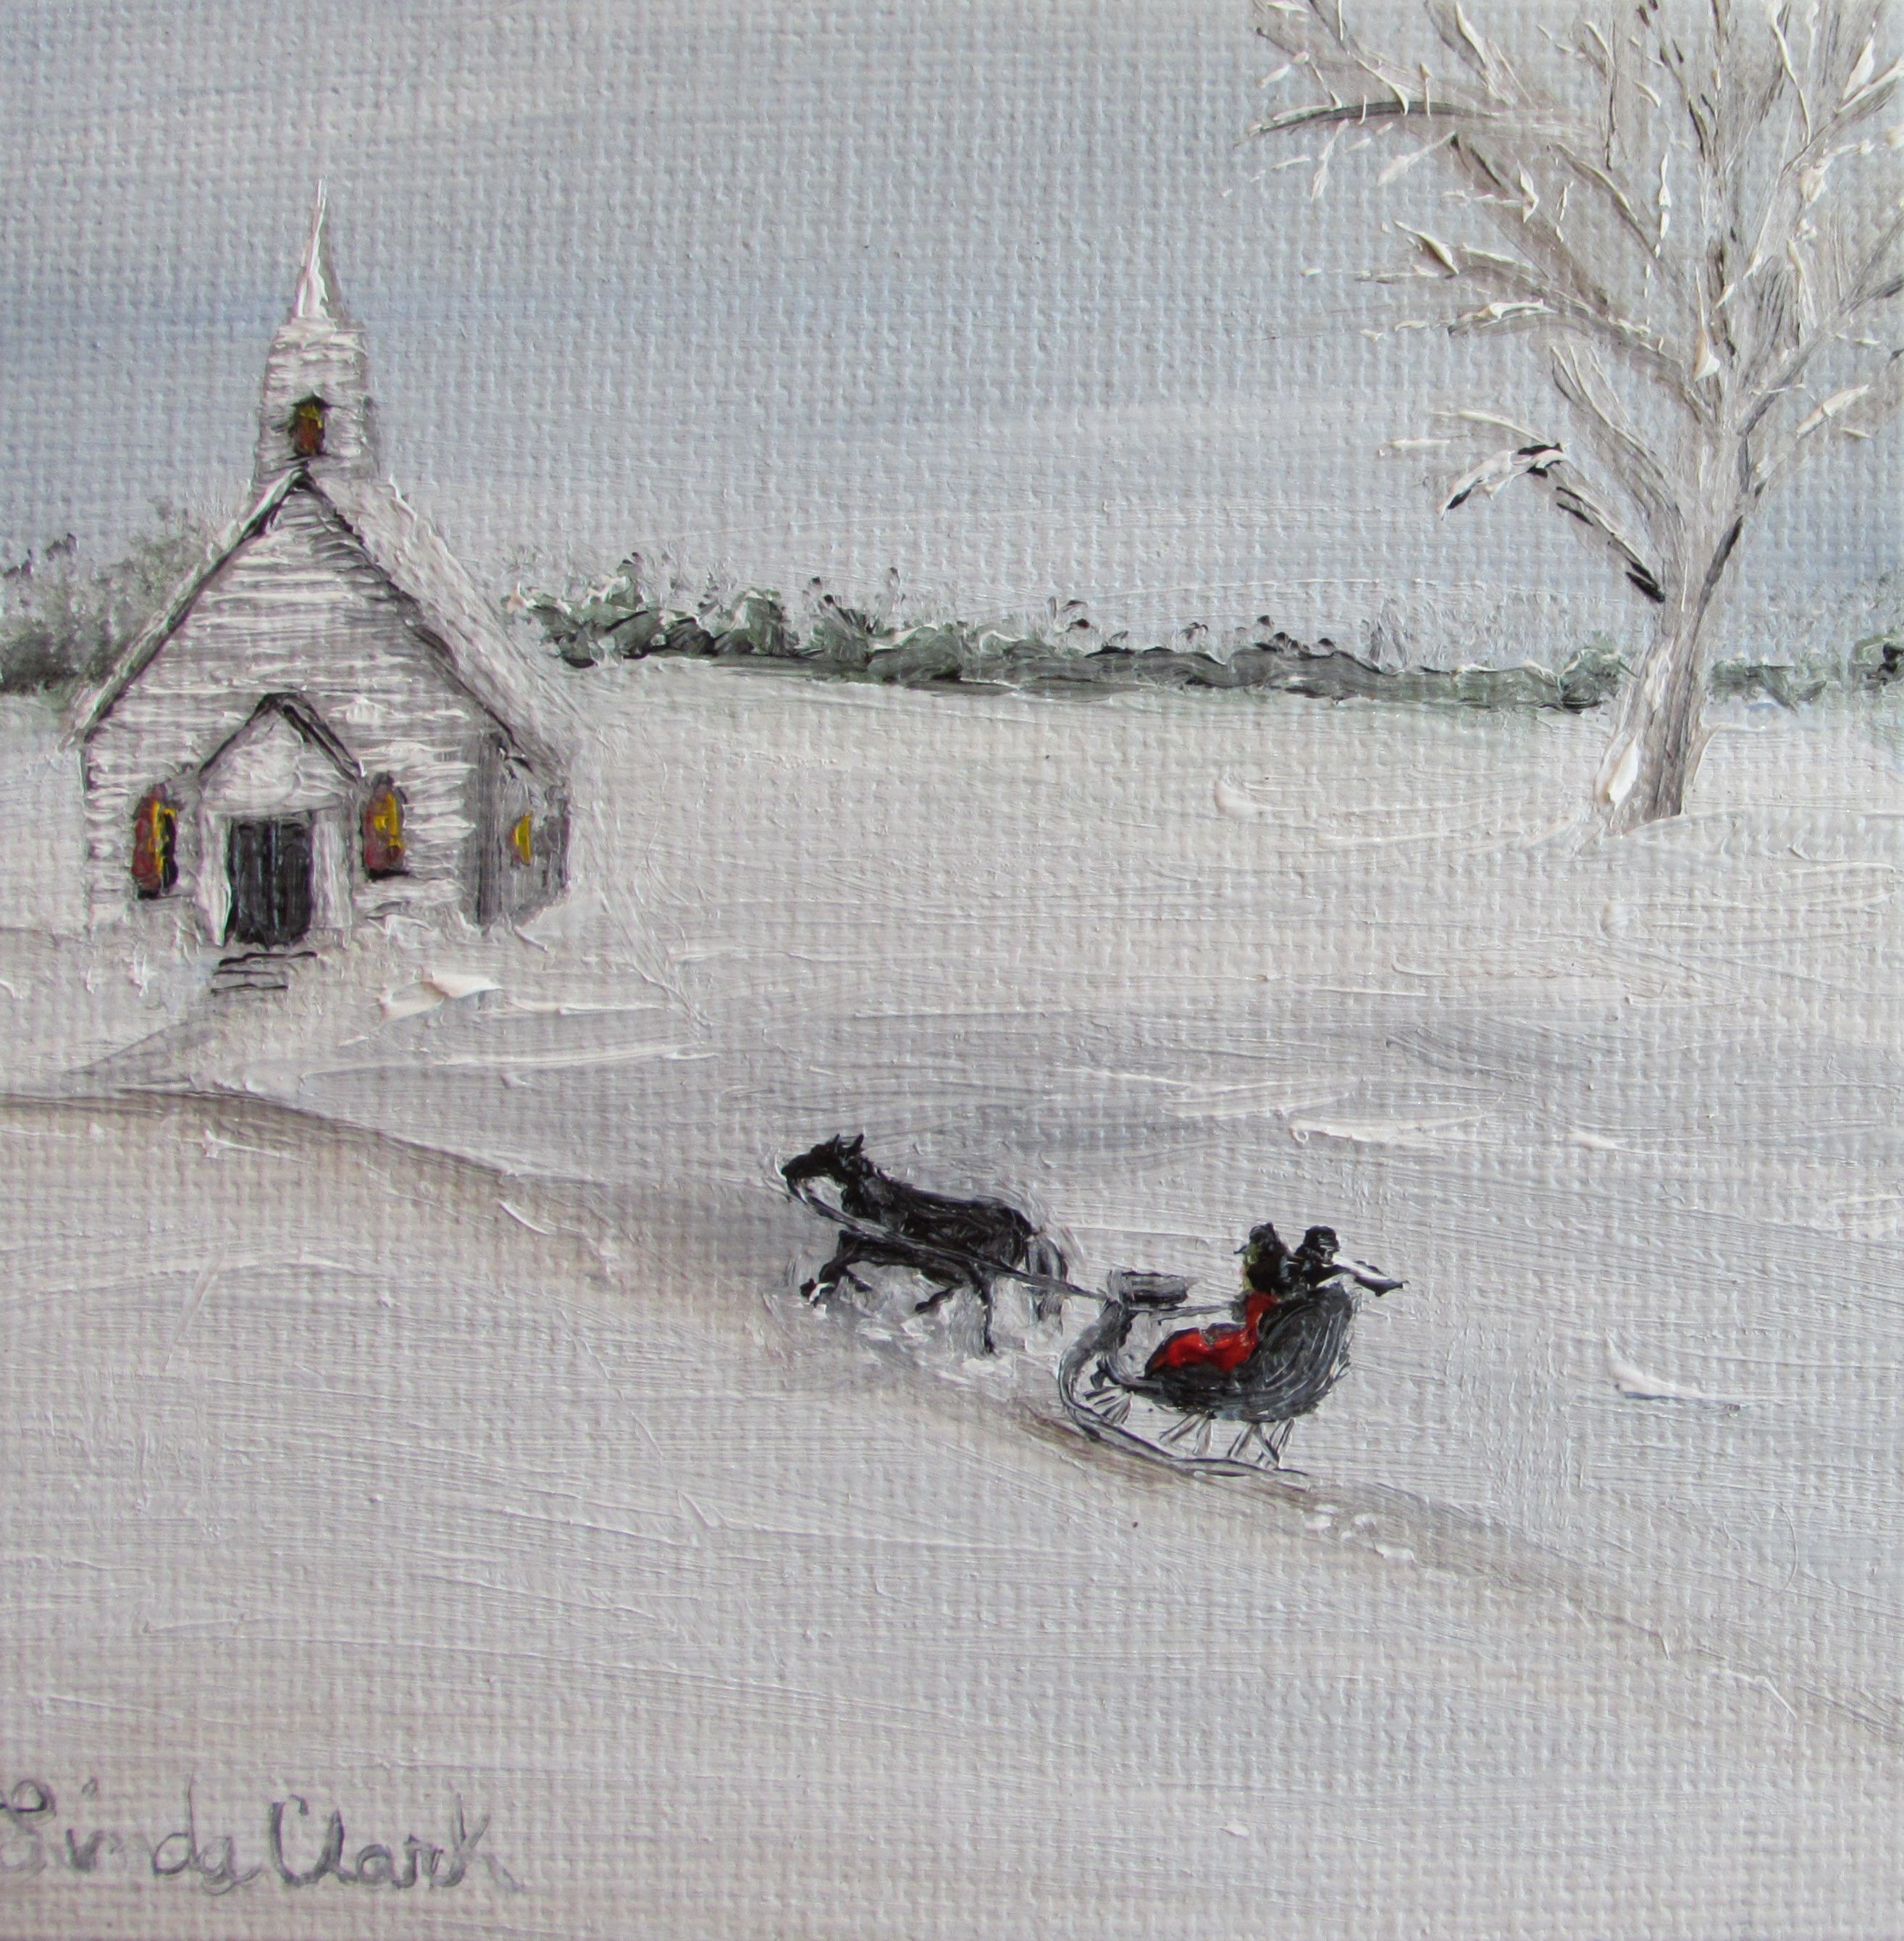 """Little White Church"" by Linda W Clark  www.creativeworksoflindaclark.com  https://www.facebook.com/CreativeWorksofLindaClark?ref=tn_tnmn"